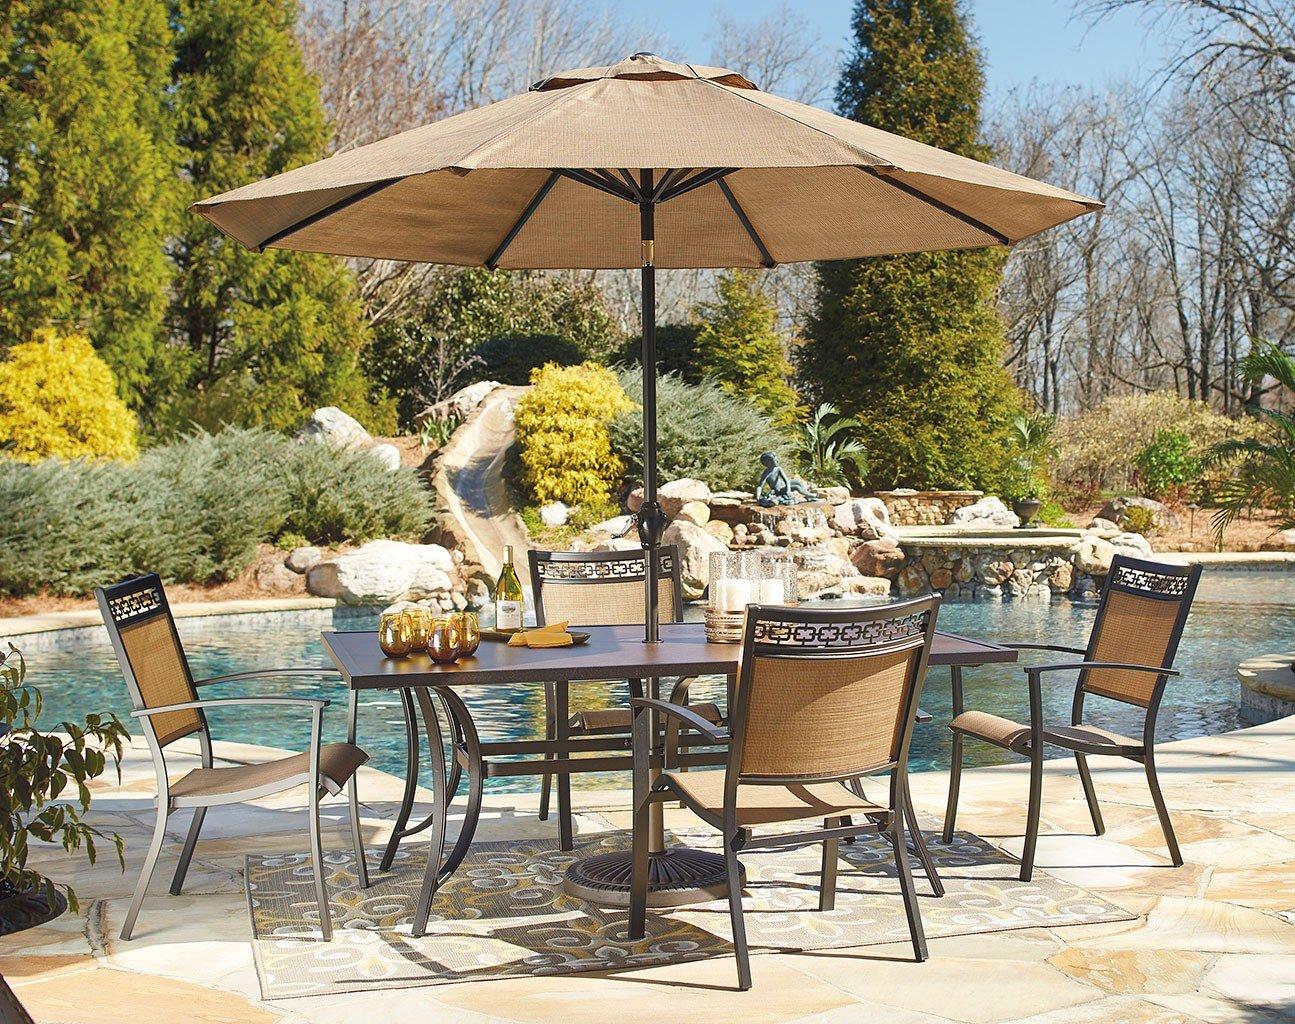 Carmadelia Outdoor Dining Set w/ Umbrella